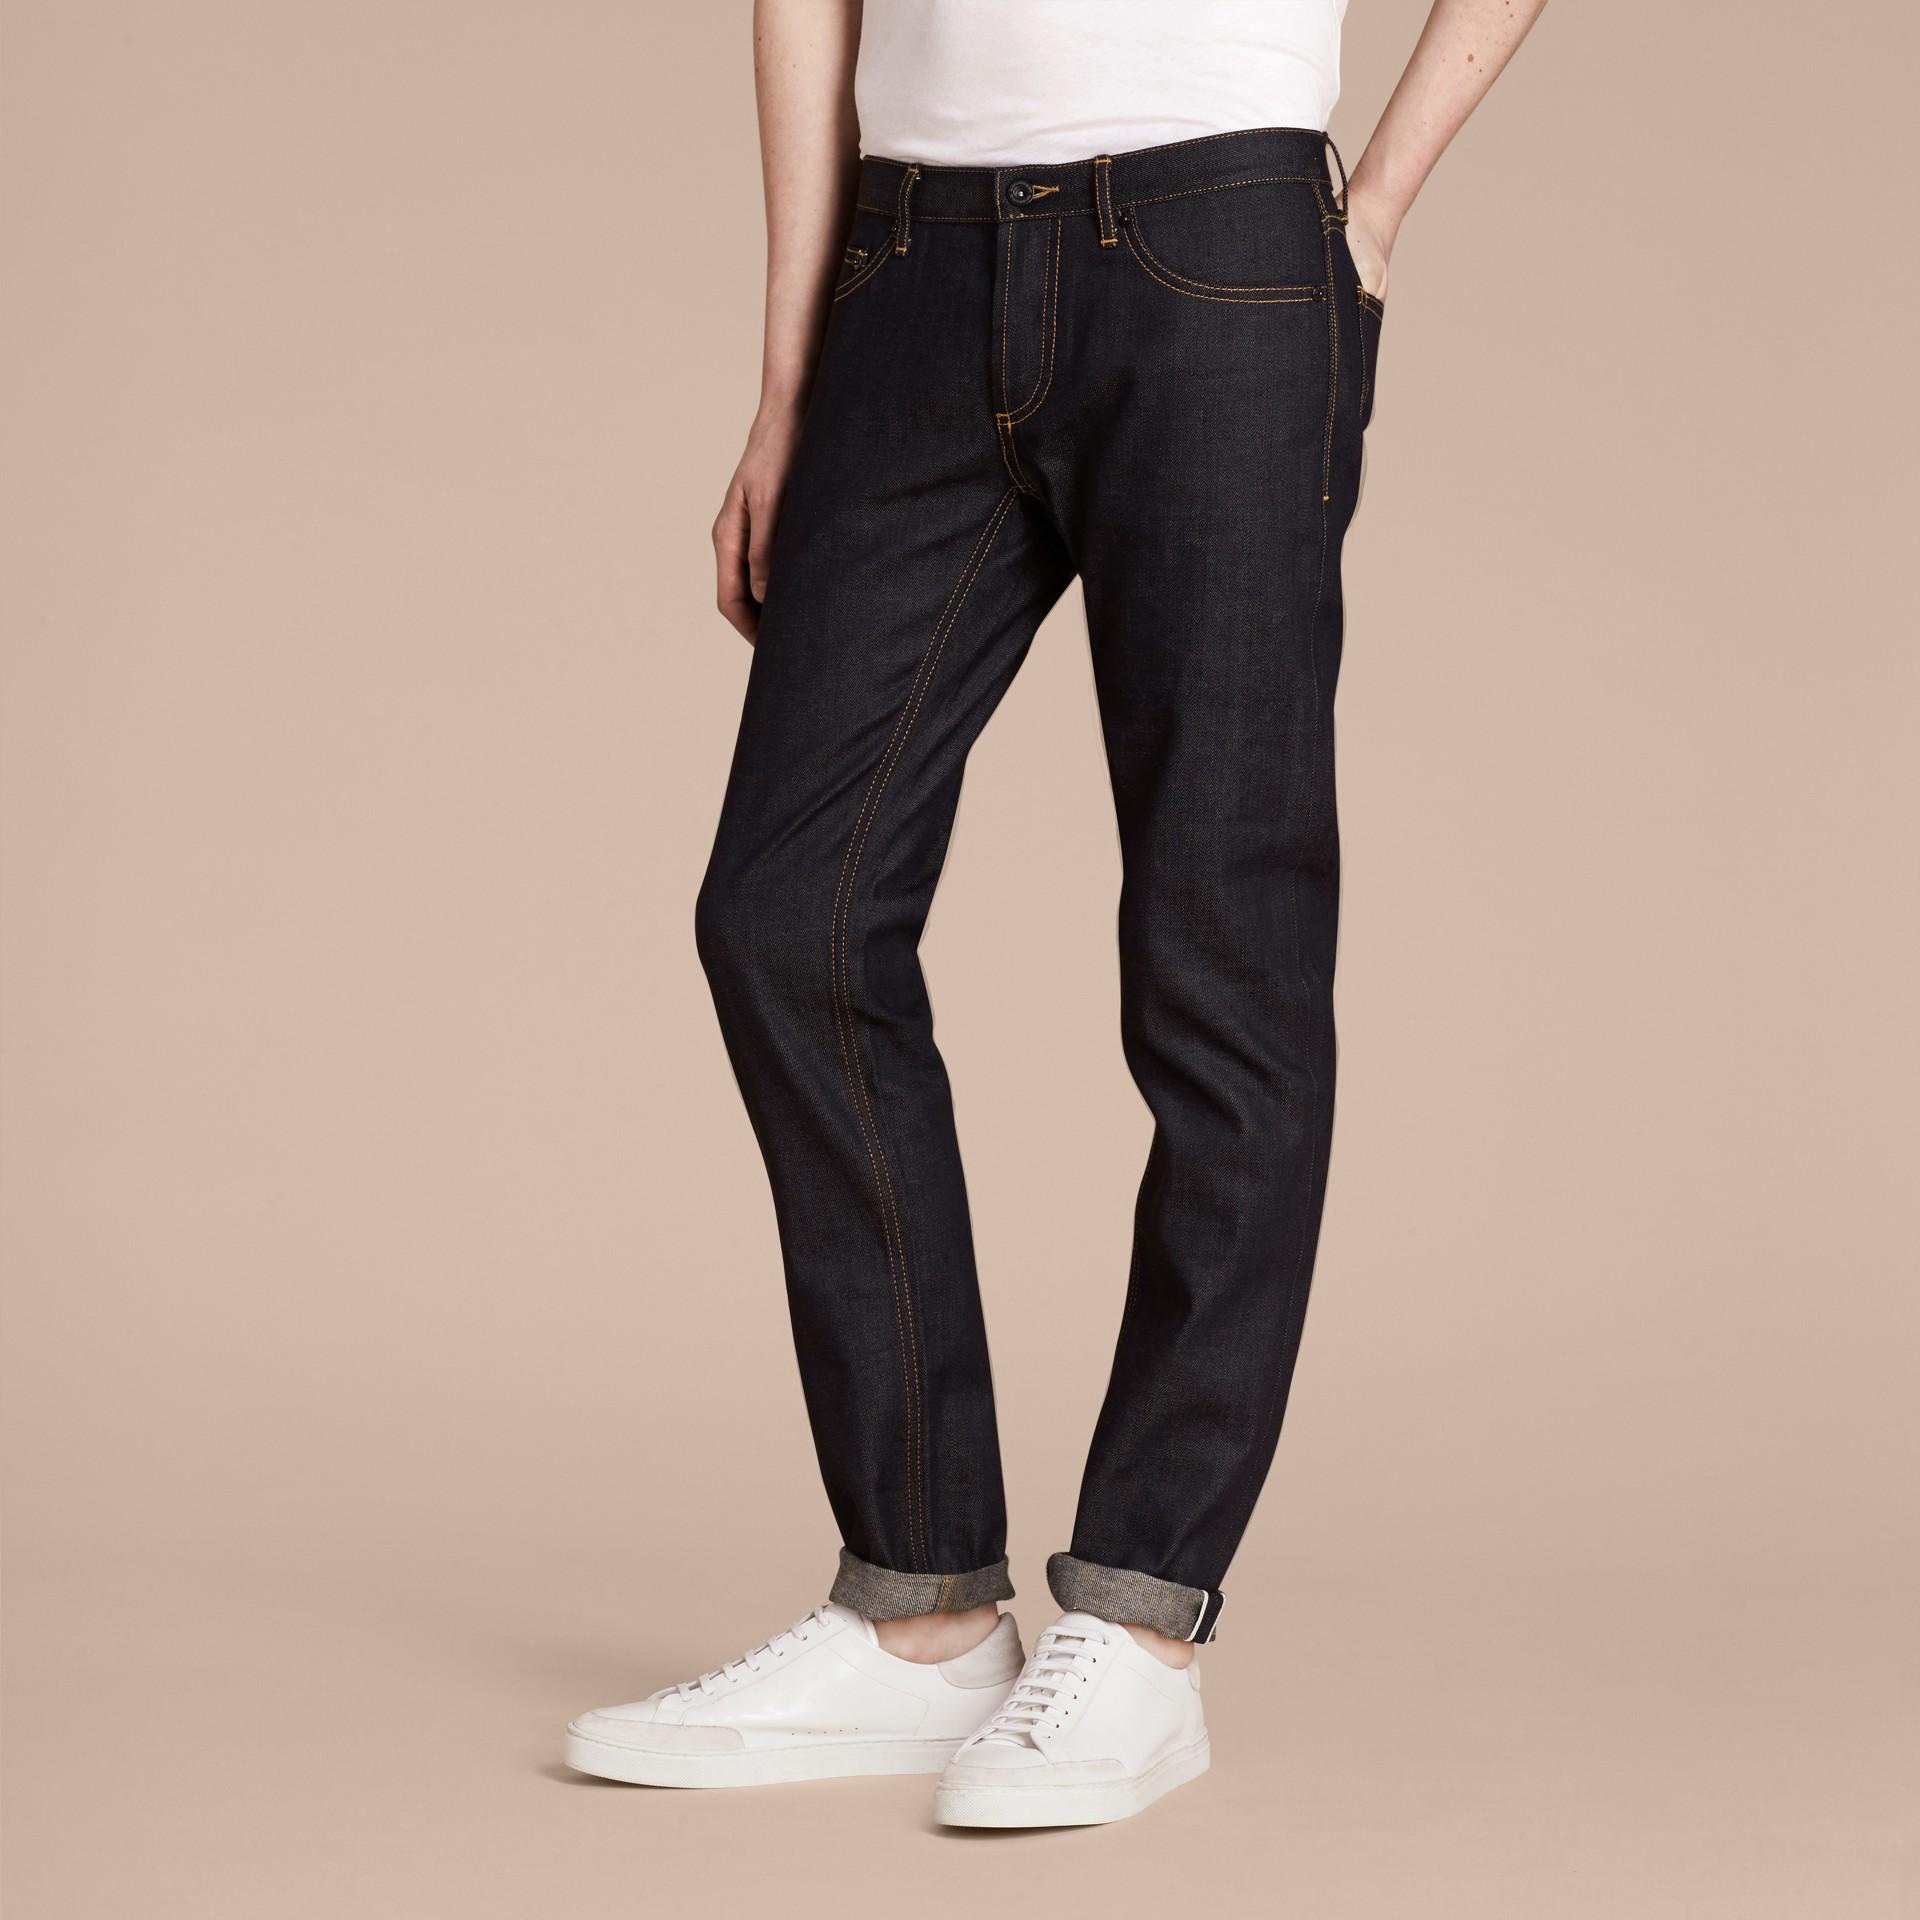 Indigo Skinny Fit Indigo Selvedge Jeans - gallery image 4